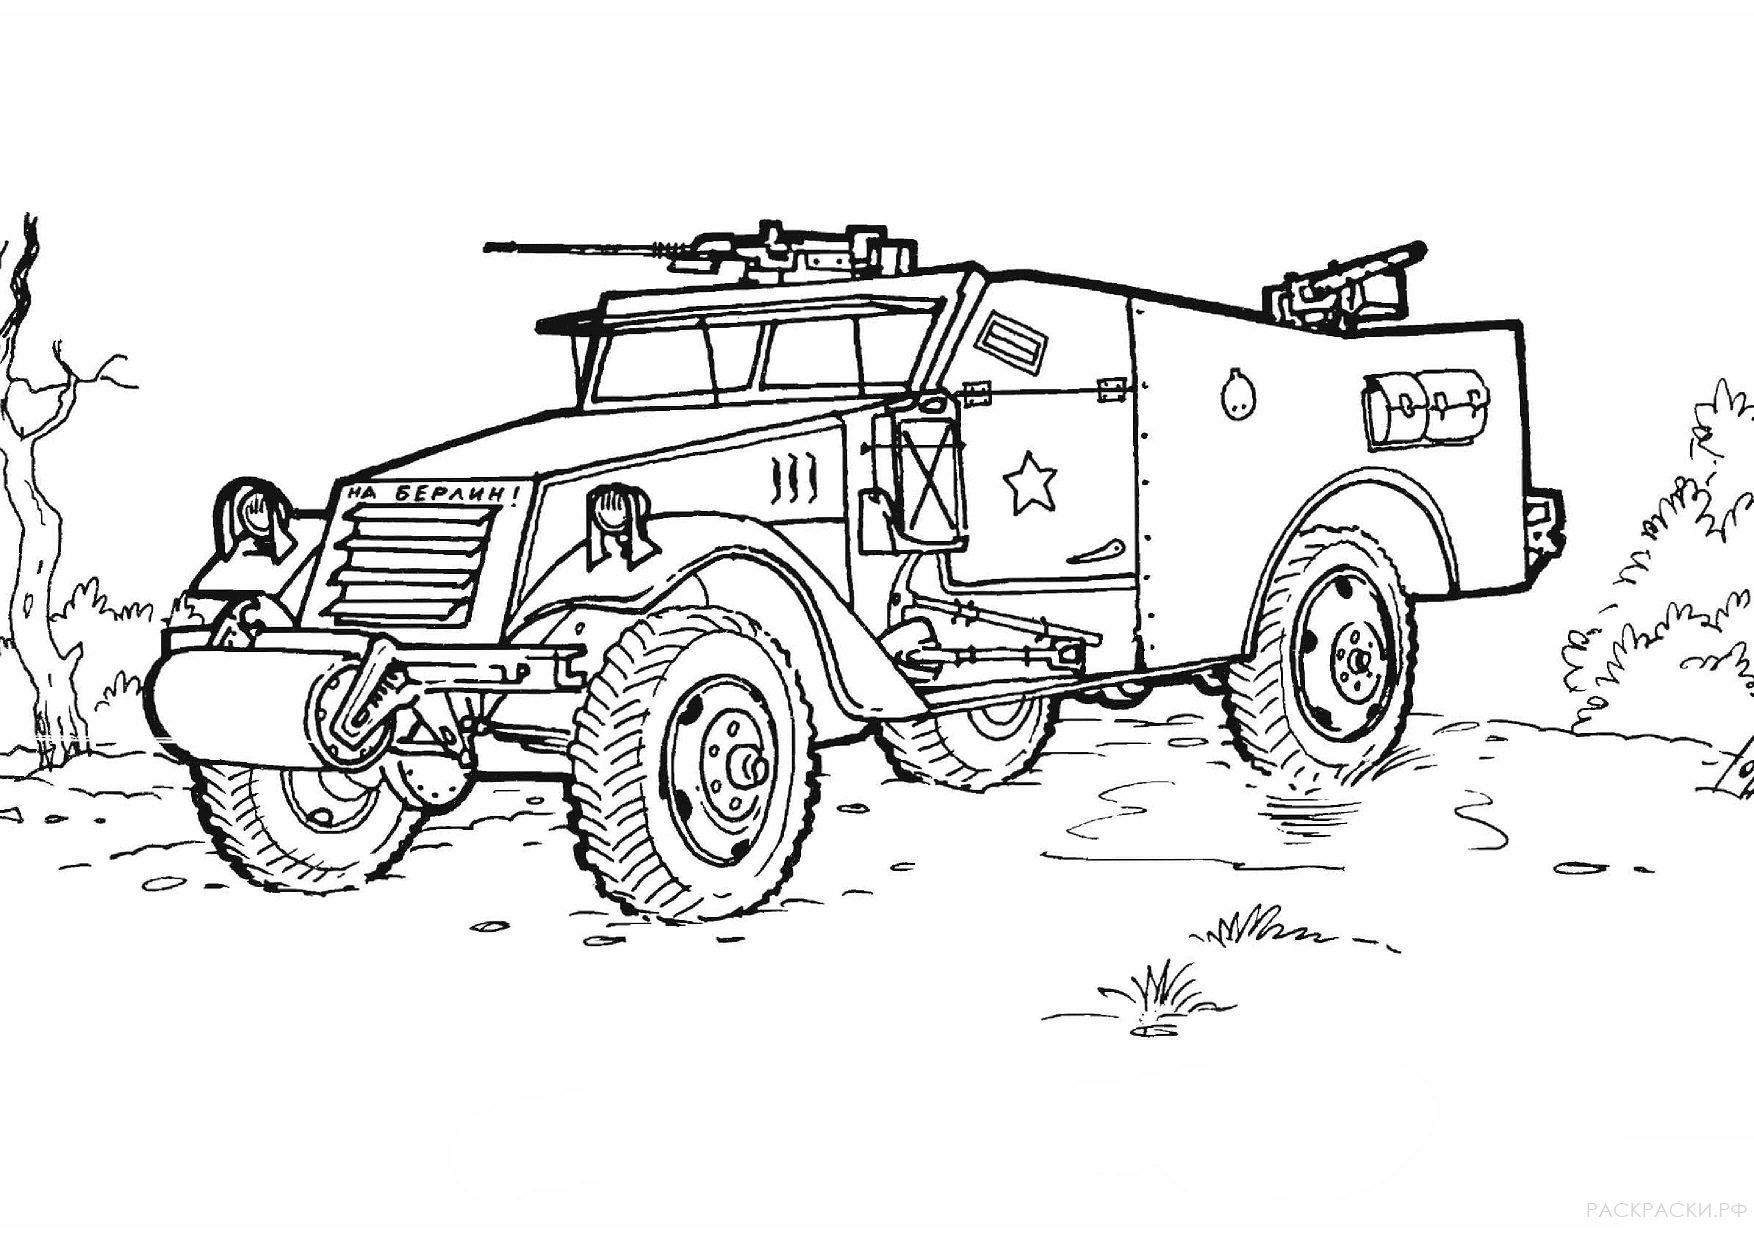 Военная Раскраска Бронетранспортёр